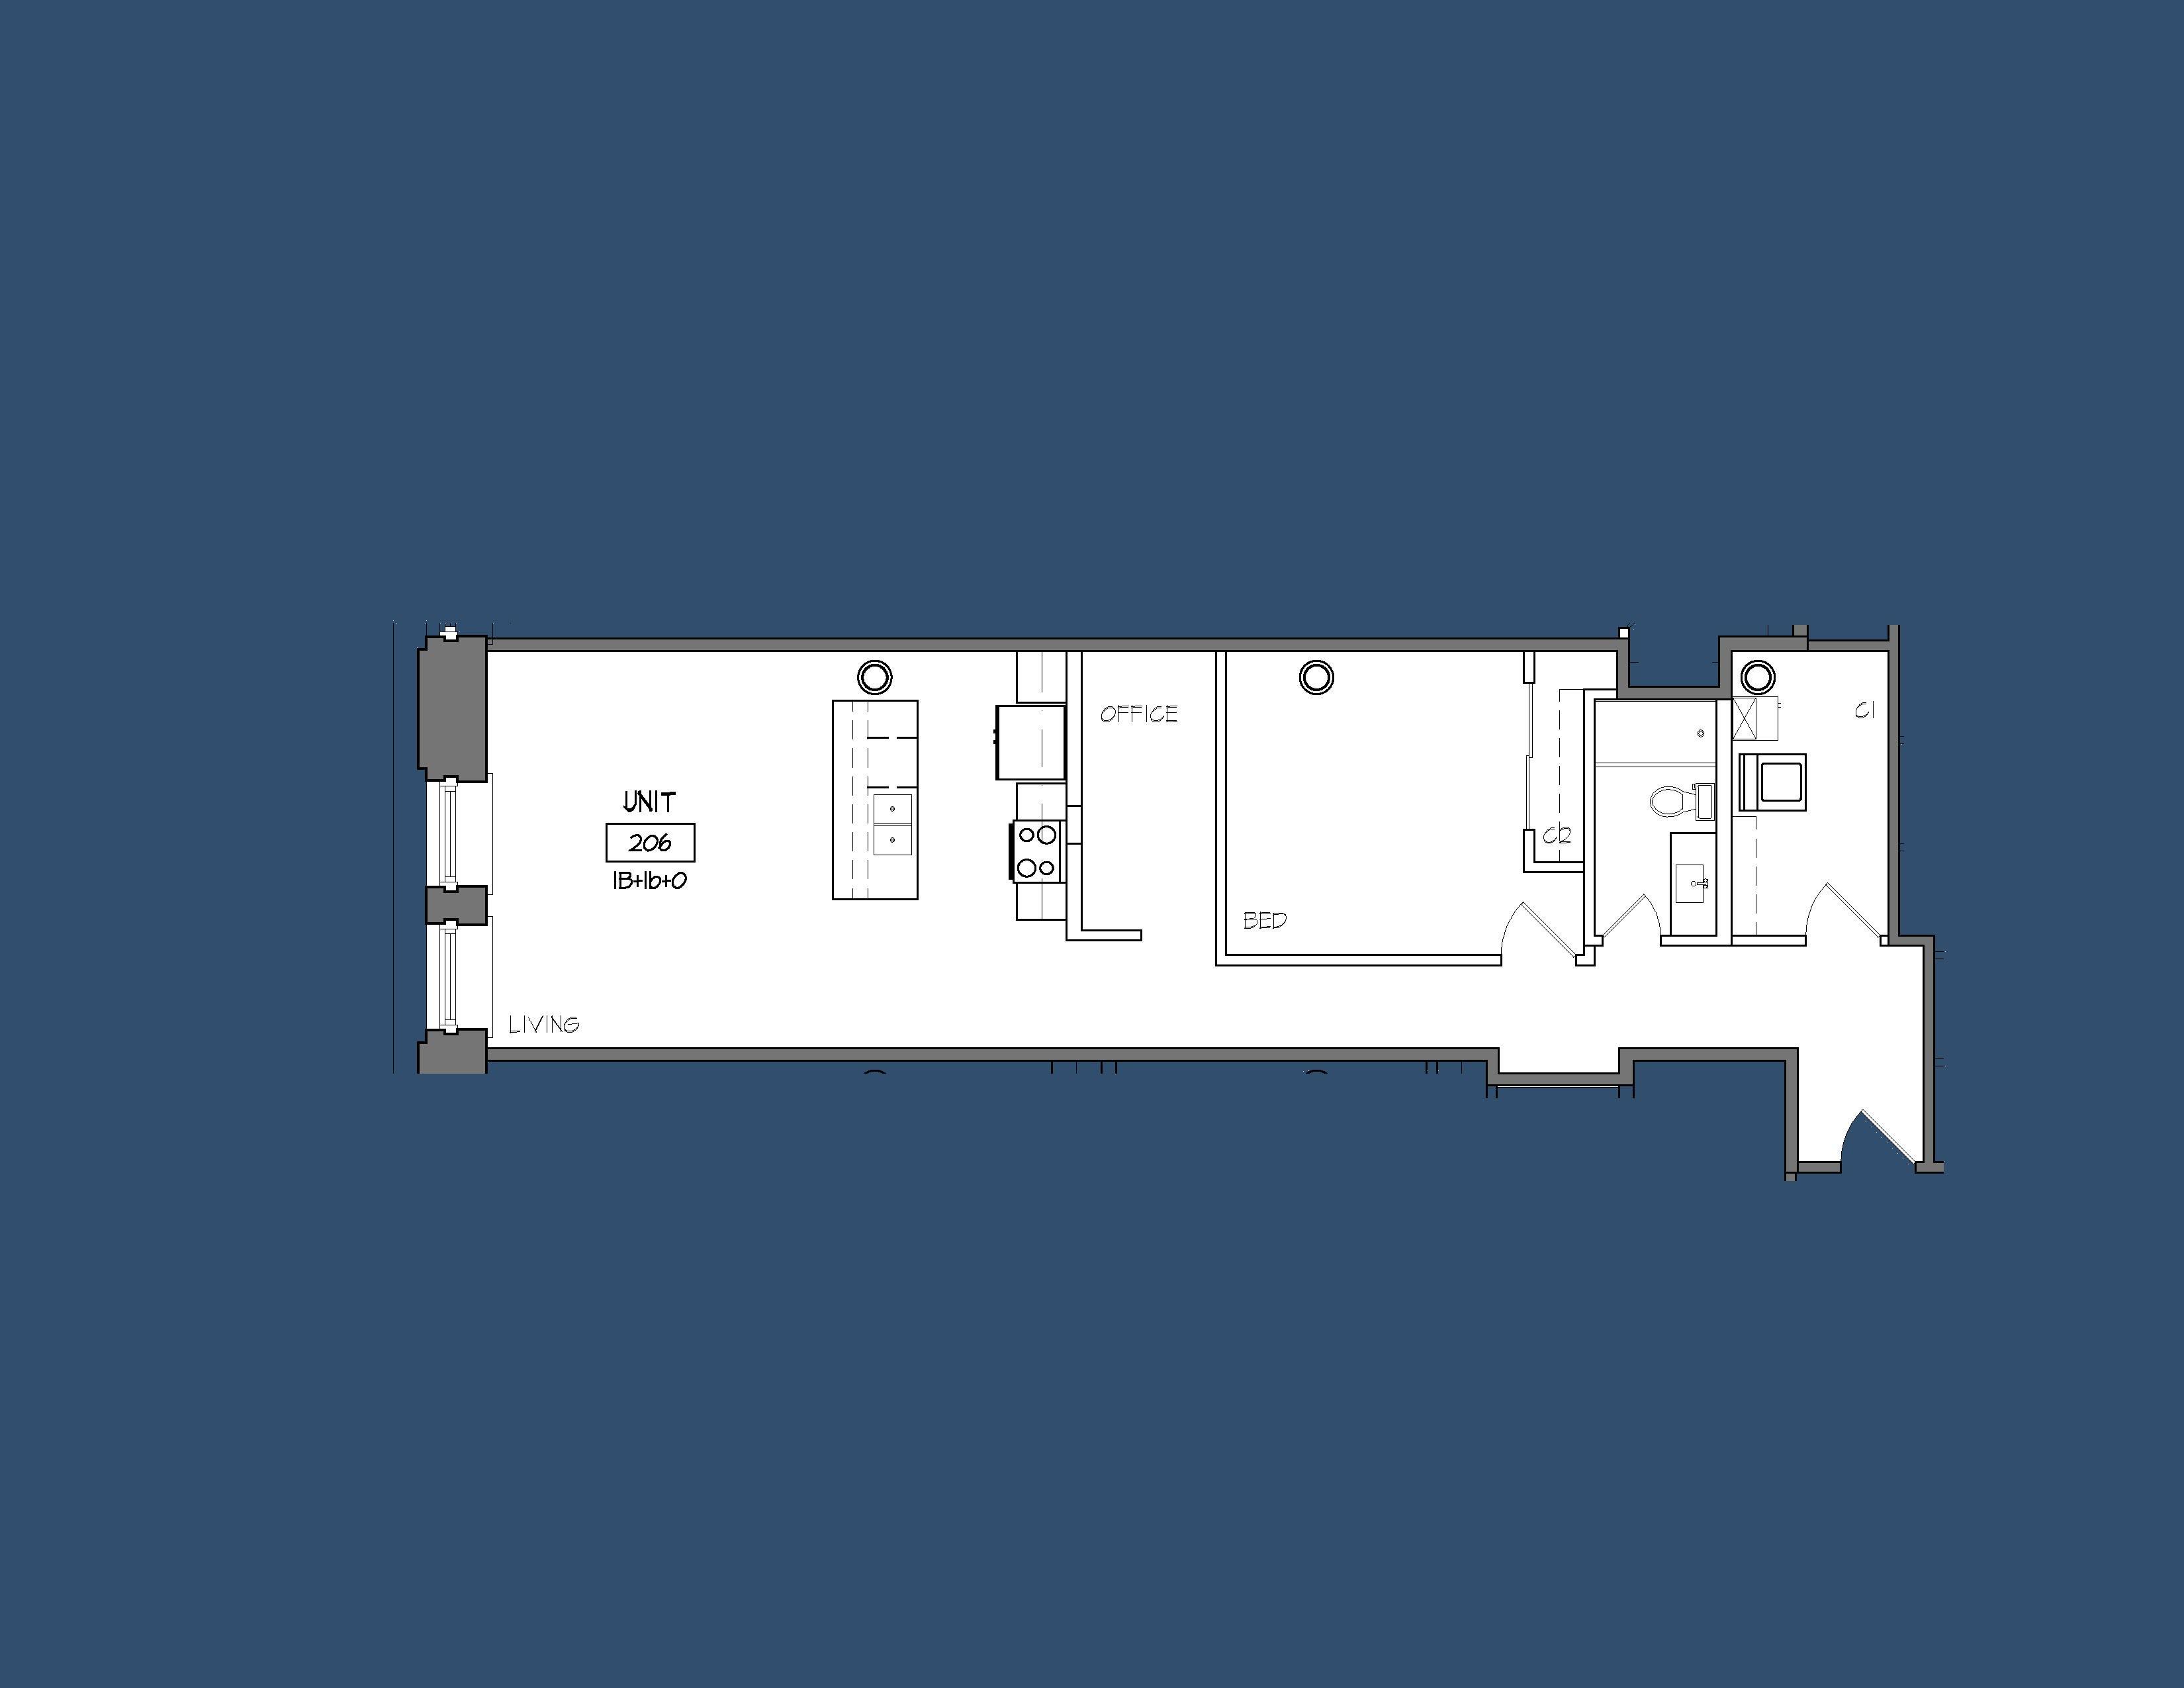 Unit 206 Floor Plan